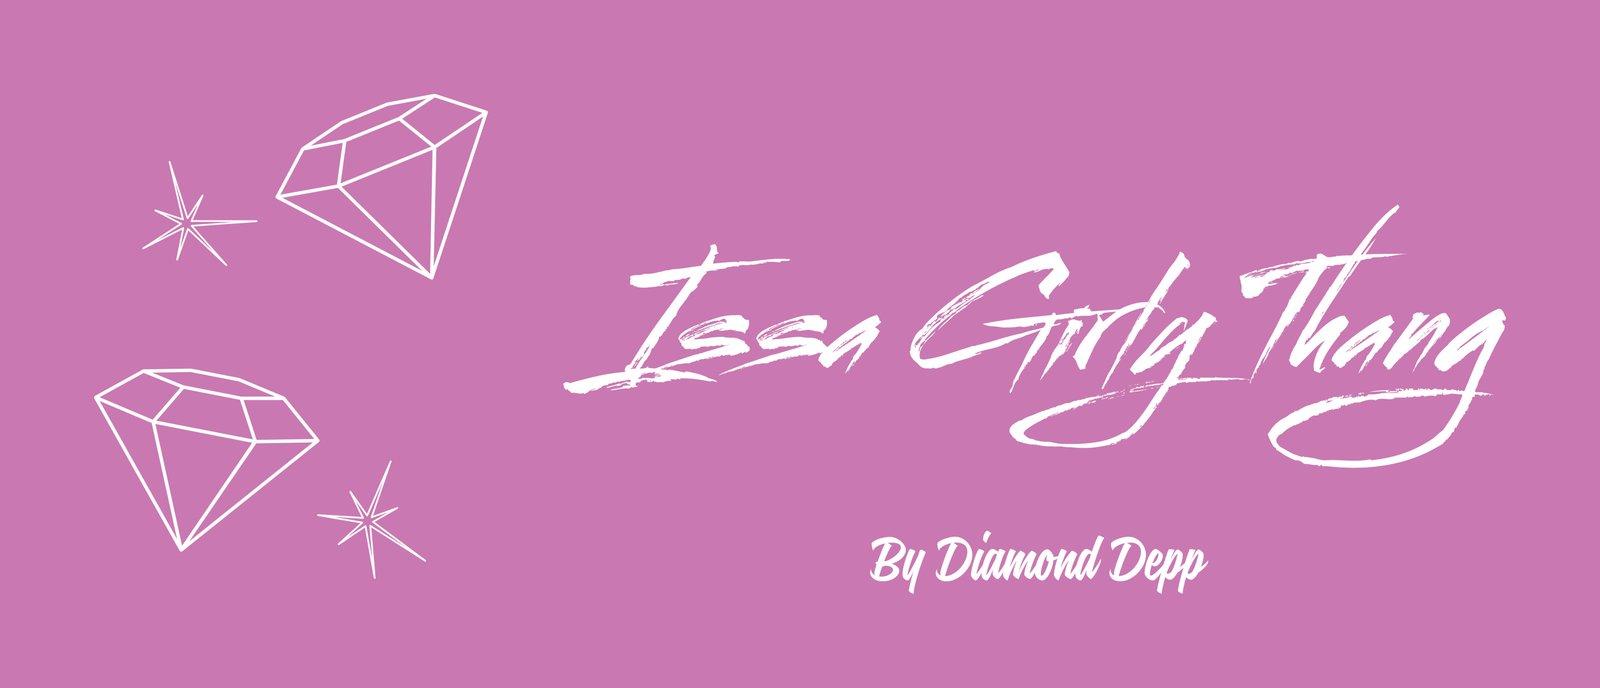 Issa Girly Thang